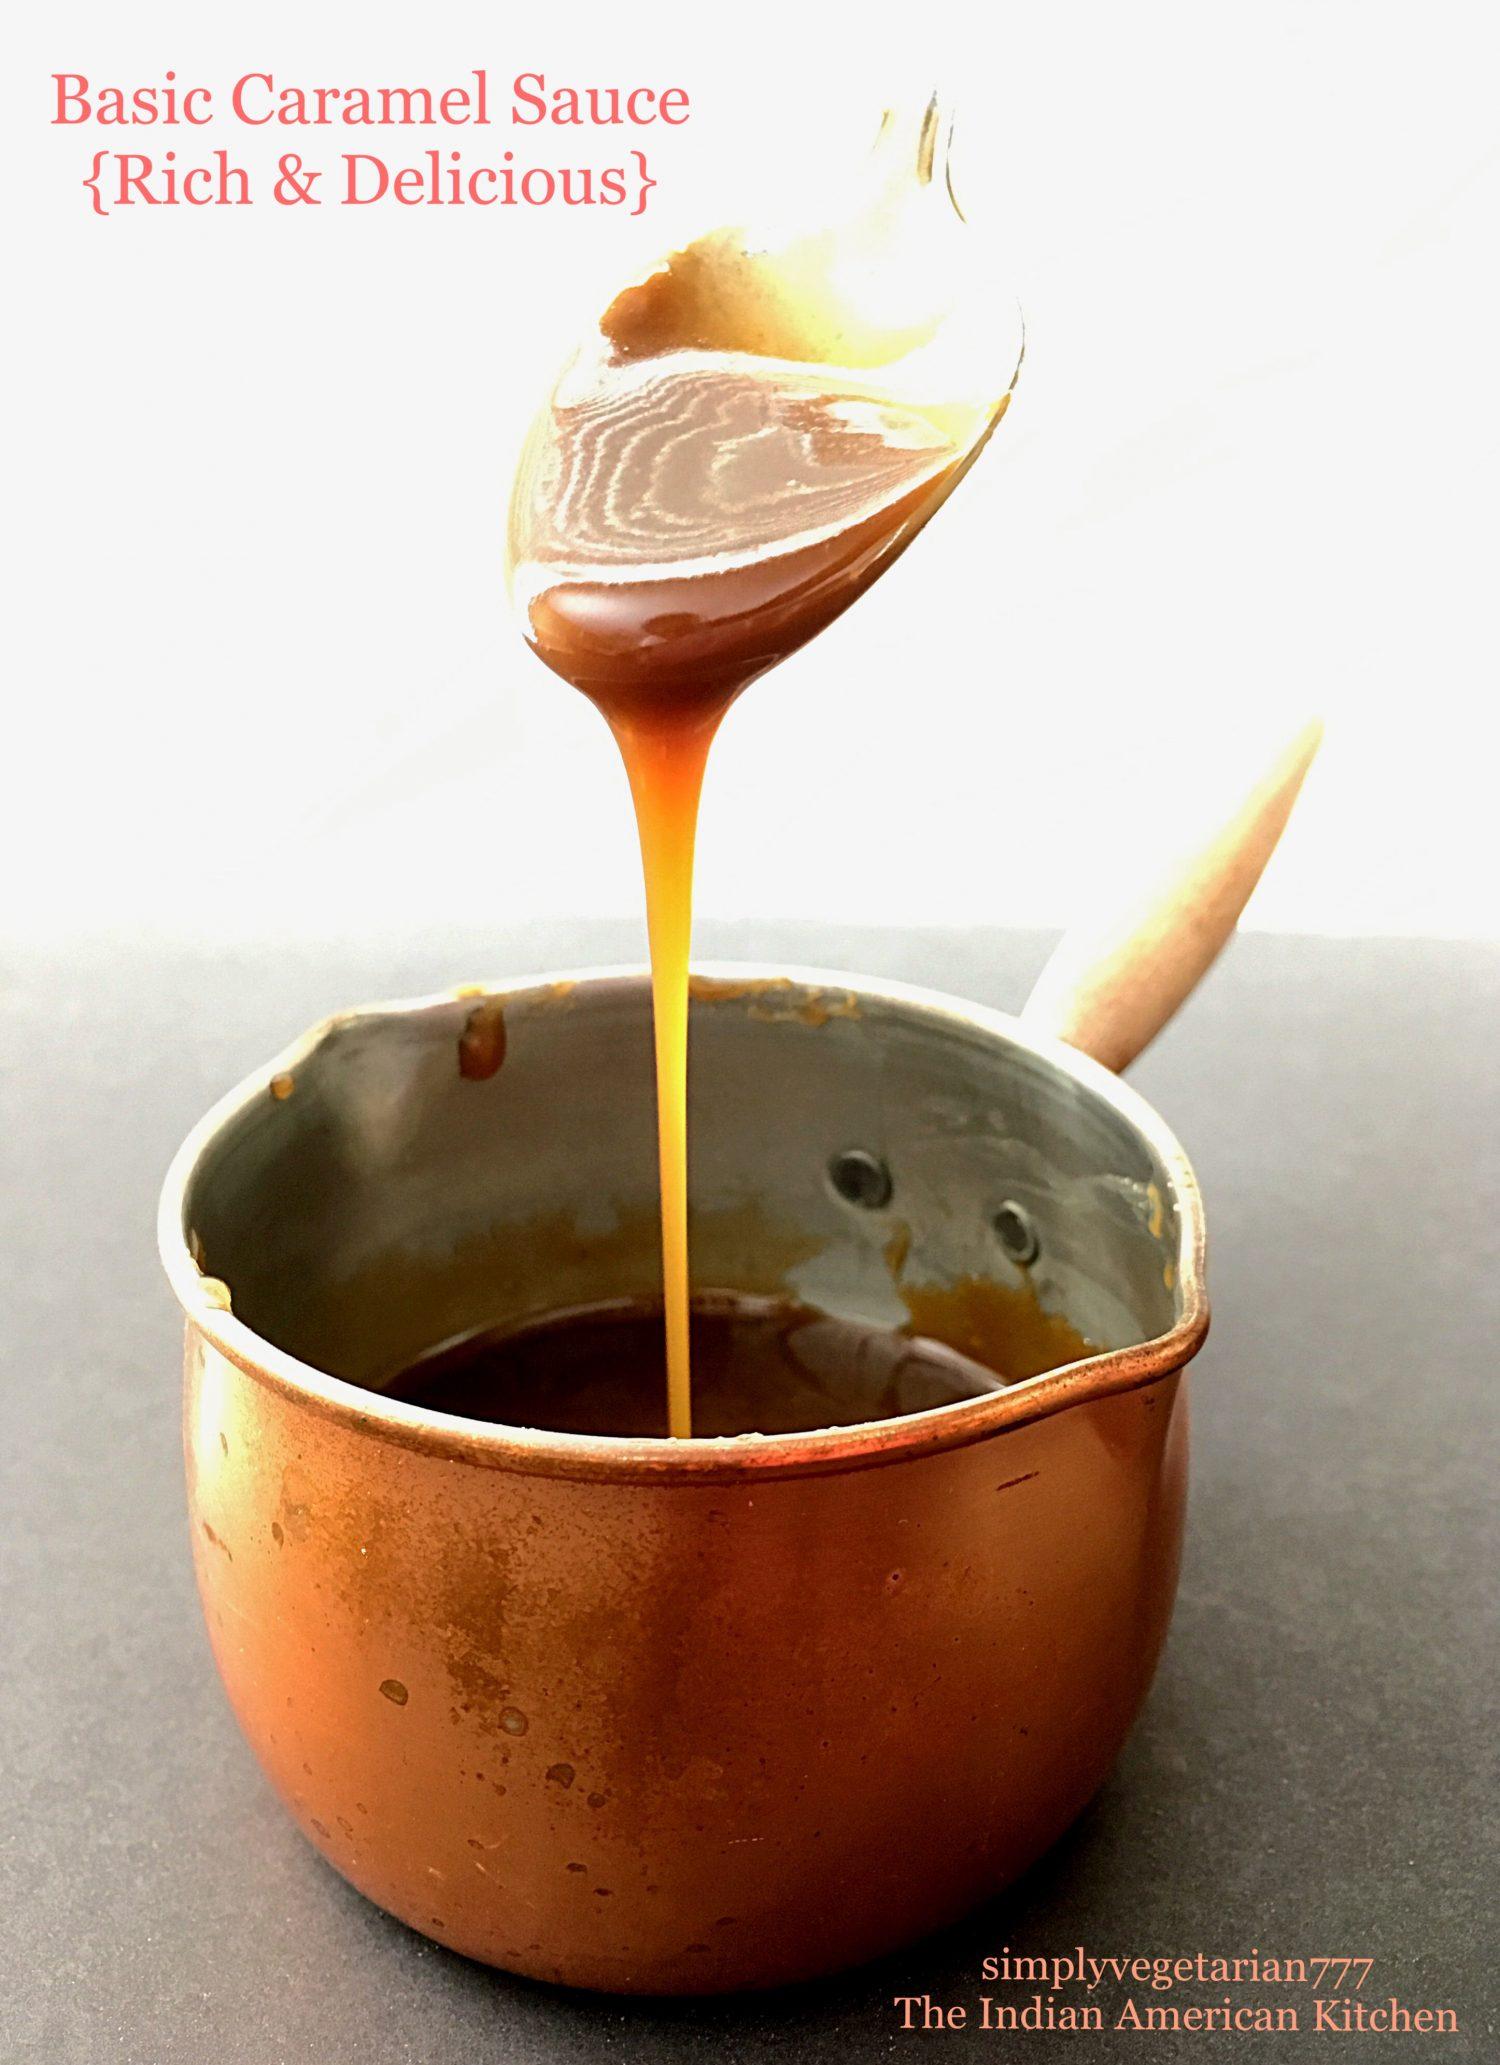 Best Basic Caramel Sauce - Rich & Delicious